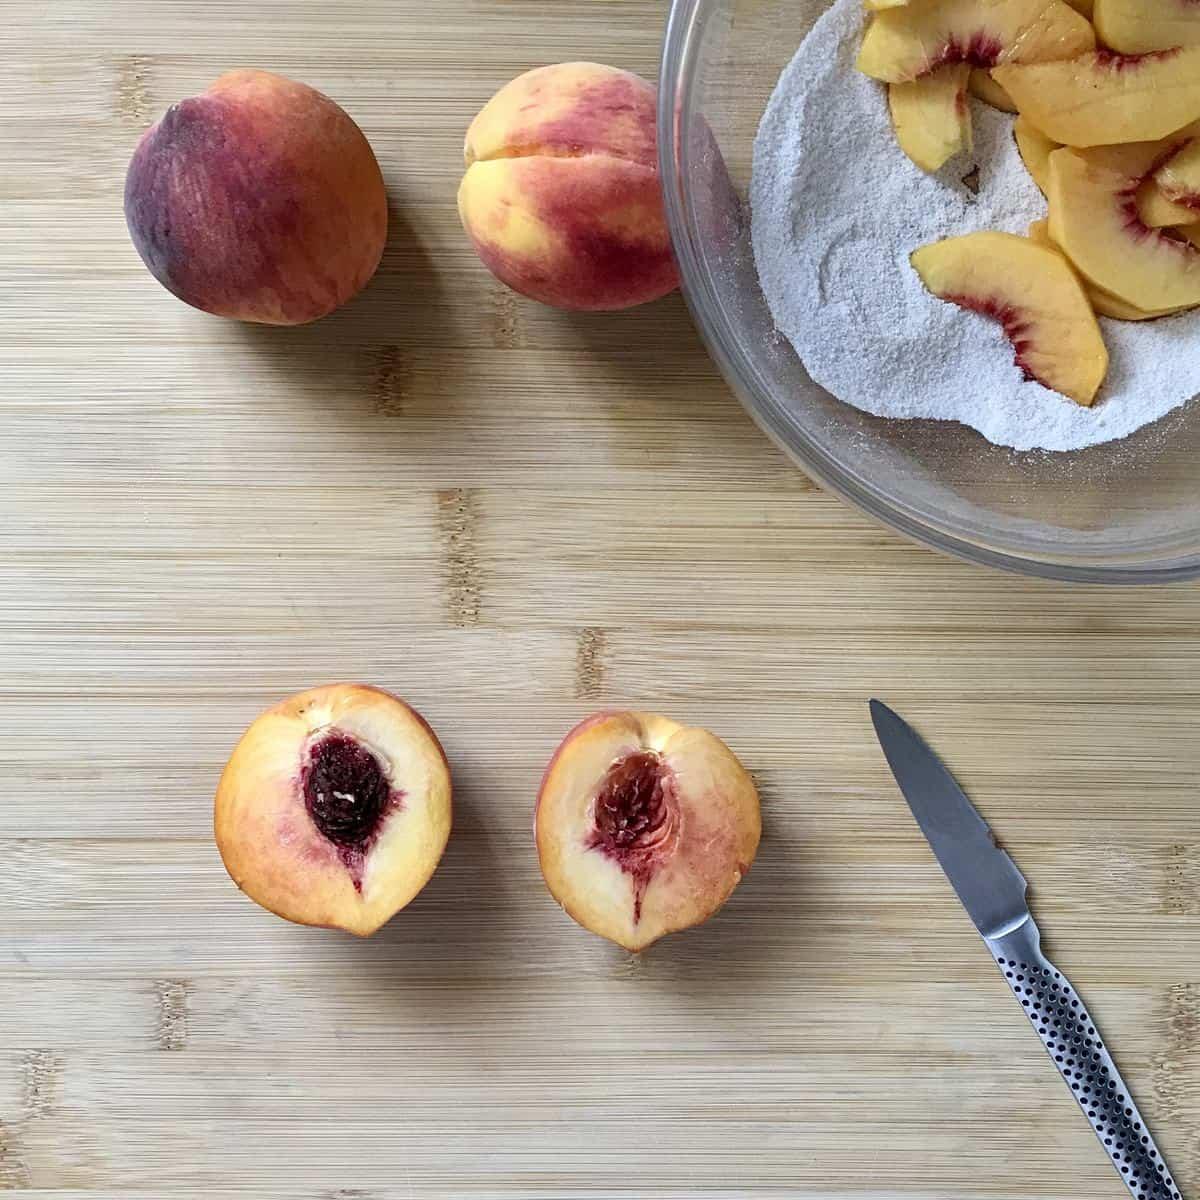 Peach halves on a cutting board.